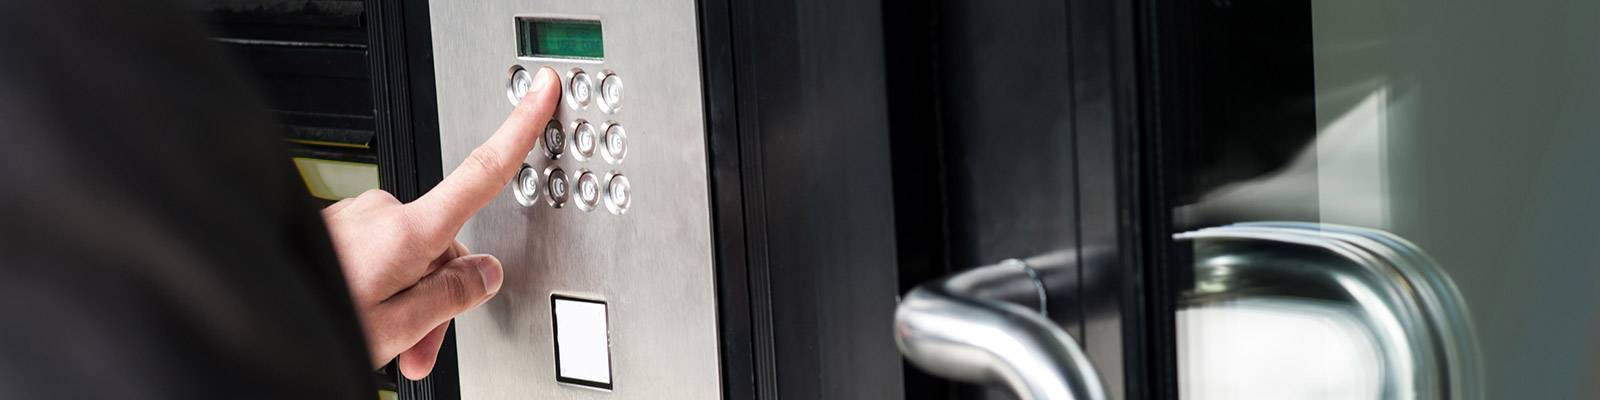 access control locksmith